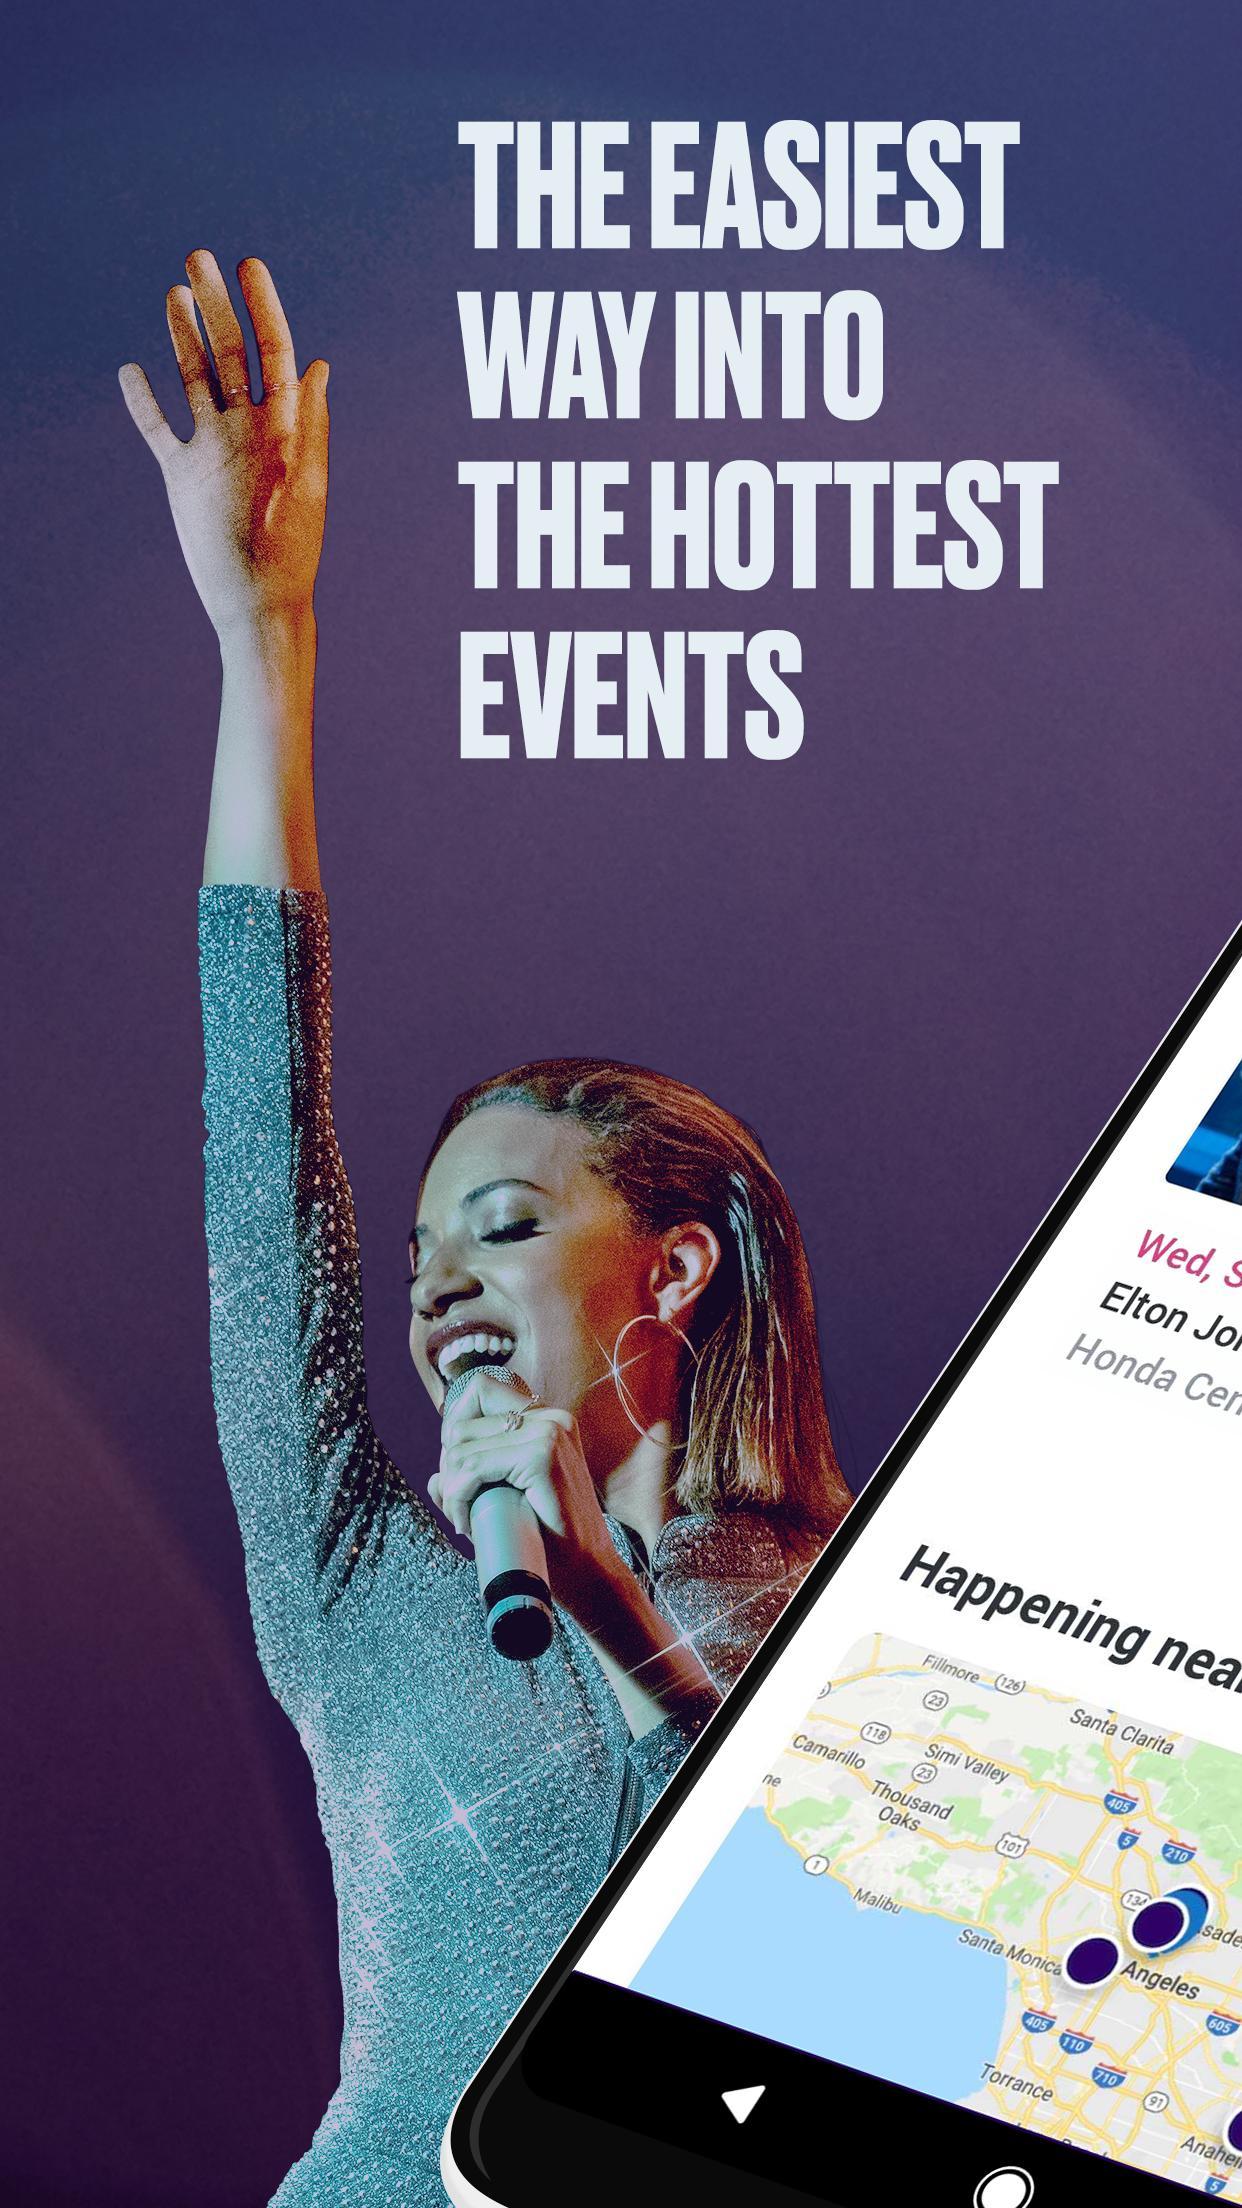 StubHub Live Event Tickets 8.2.0 Screenshot 1